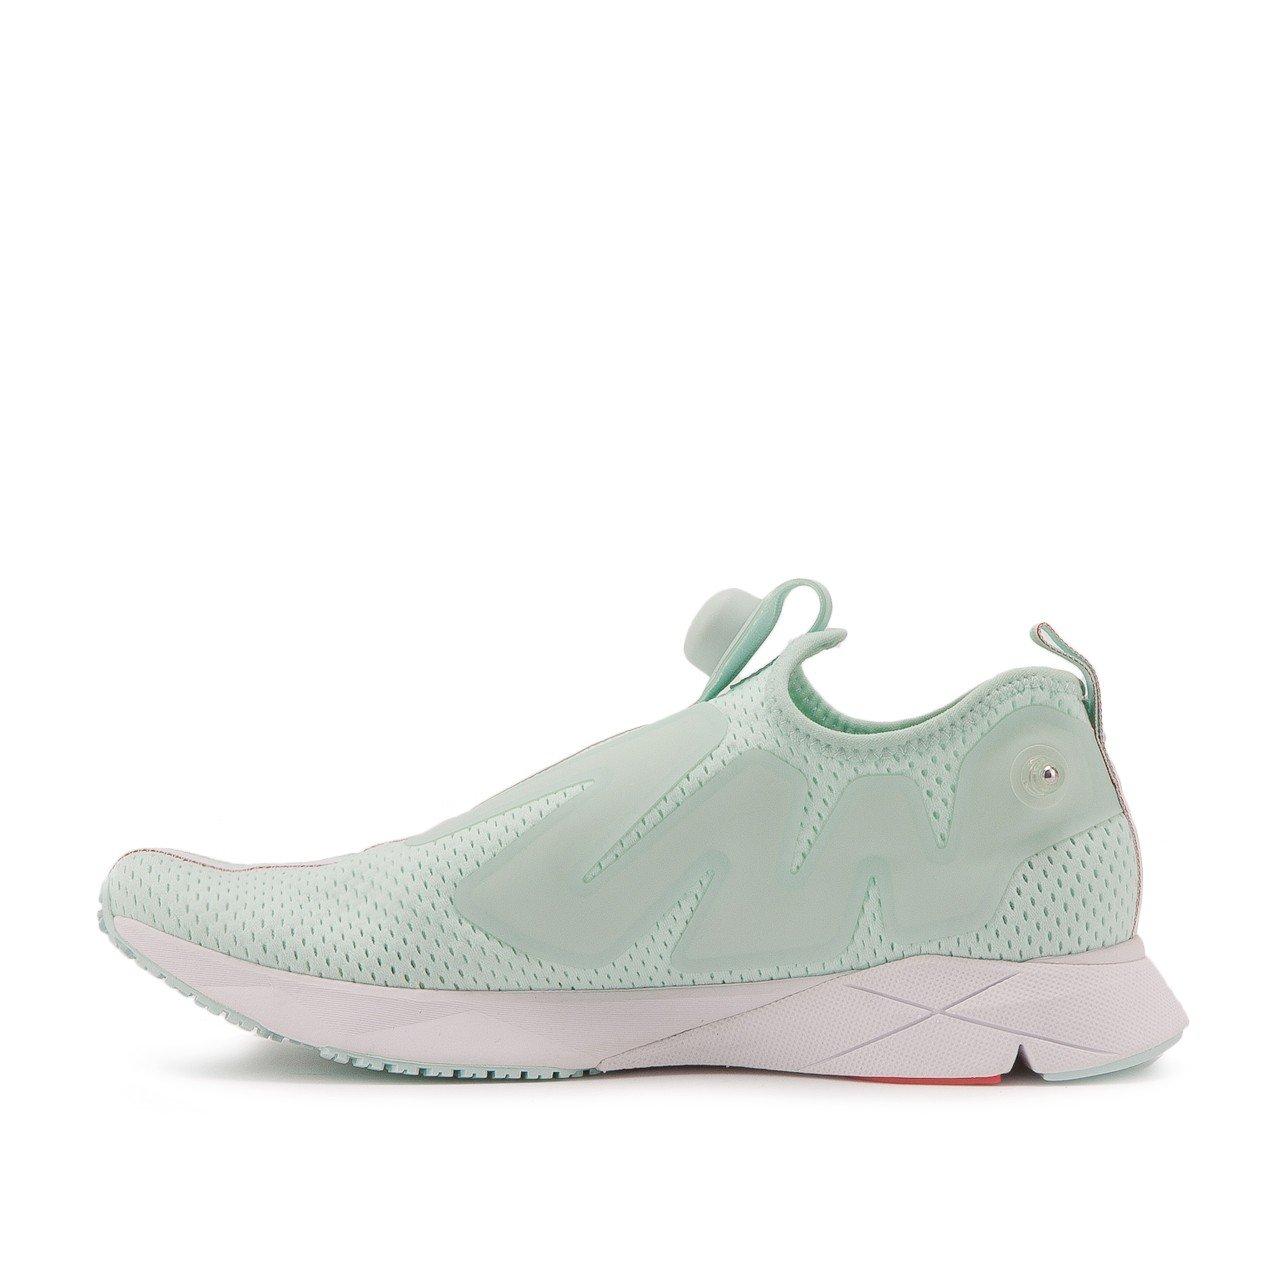 Reebok Pump Supreme Jaqtape Sneaker